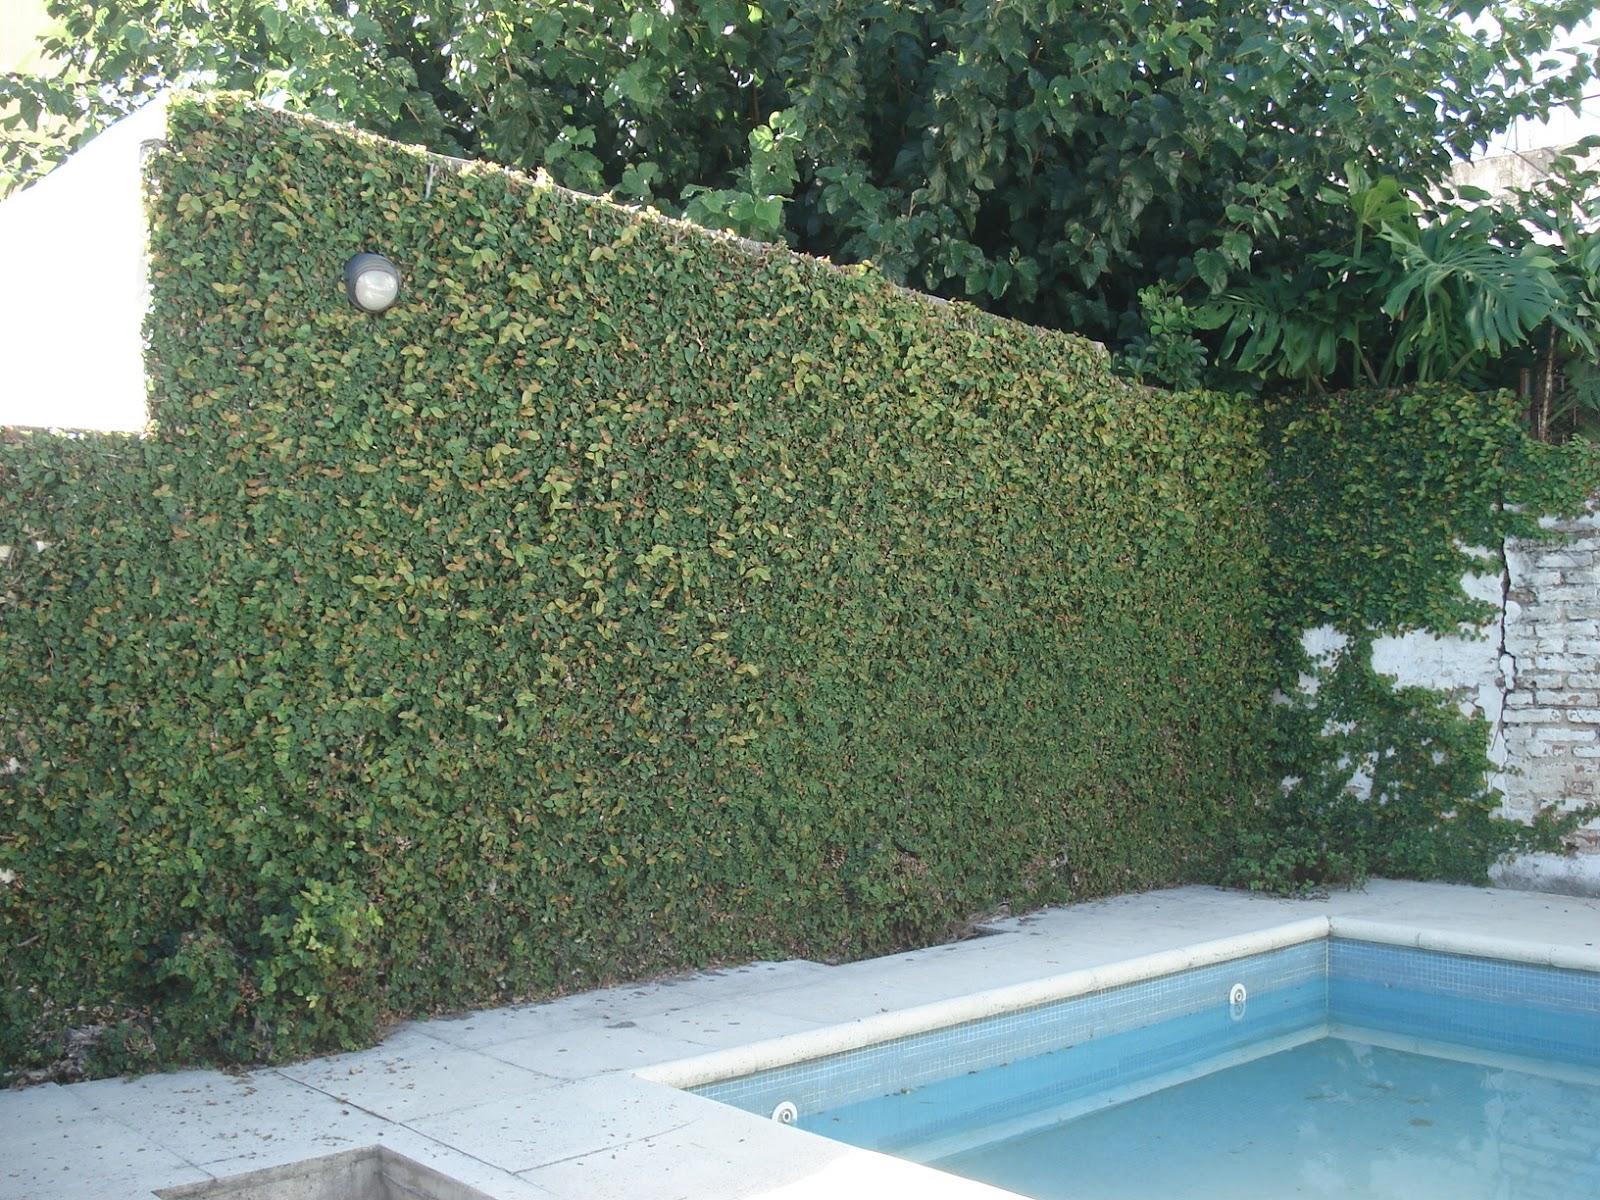 Reverdir jardineria y paisajismo mantenimientos for Jardineria y paisajismo